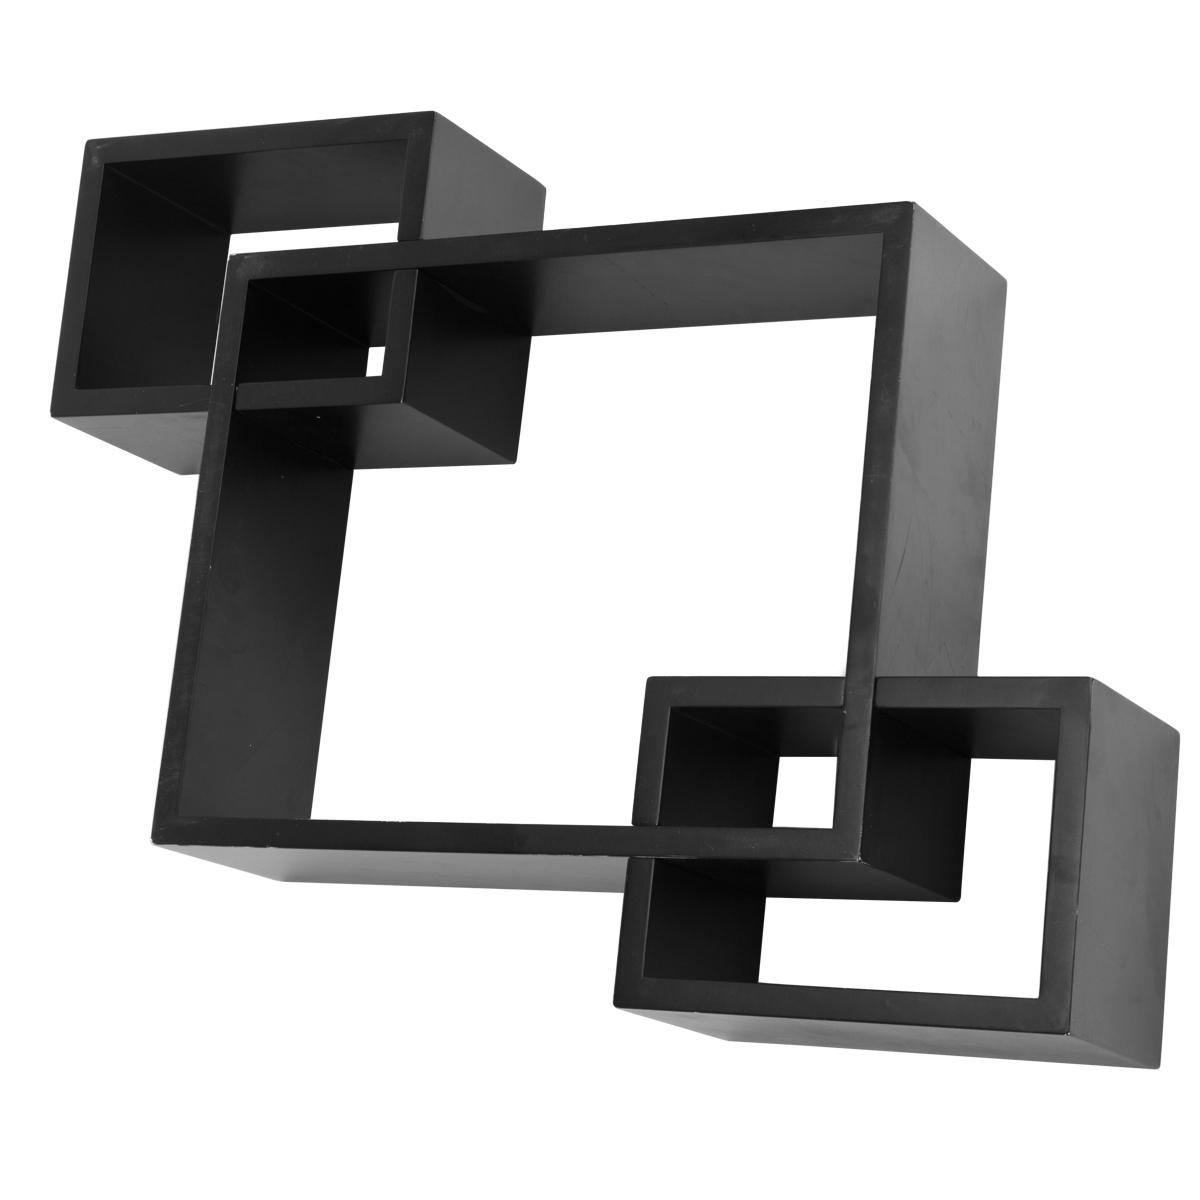 new black floating wall mounted cube shelves concealed. Black Bedroom Furniture Sets. Home Design Ideas